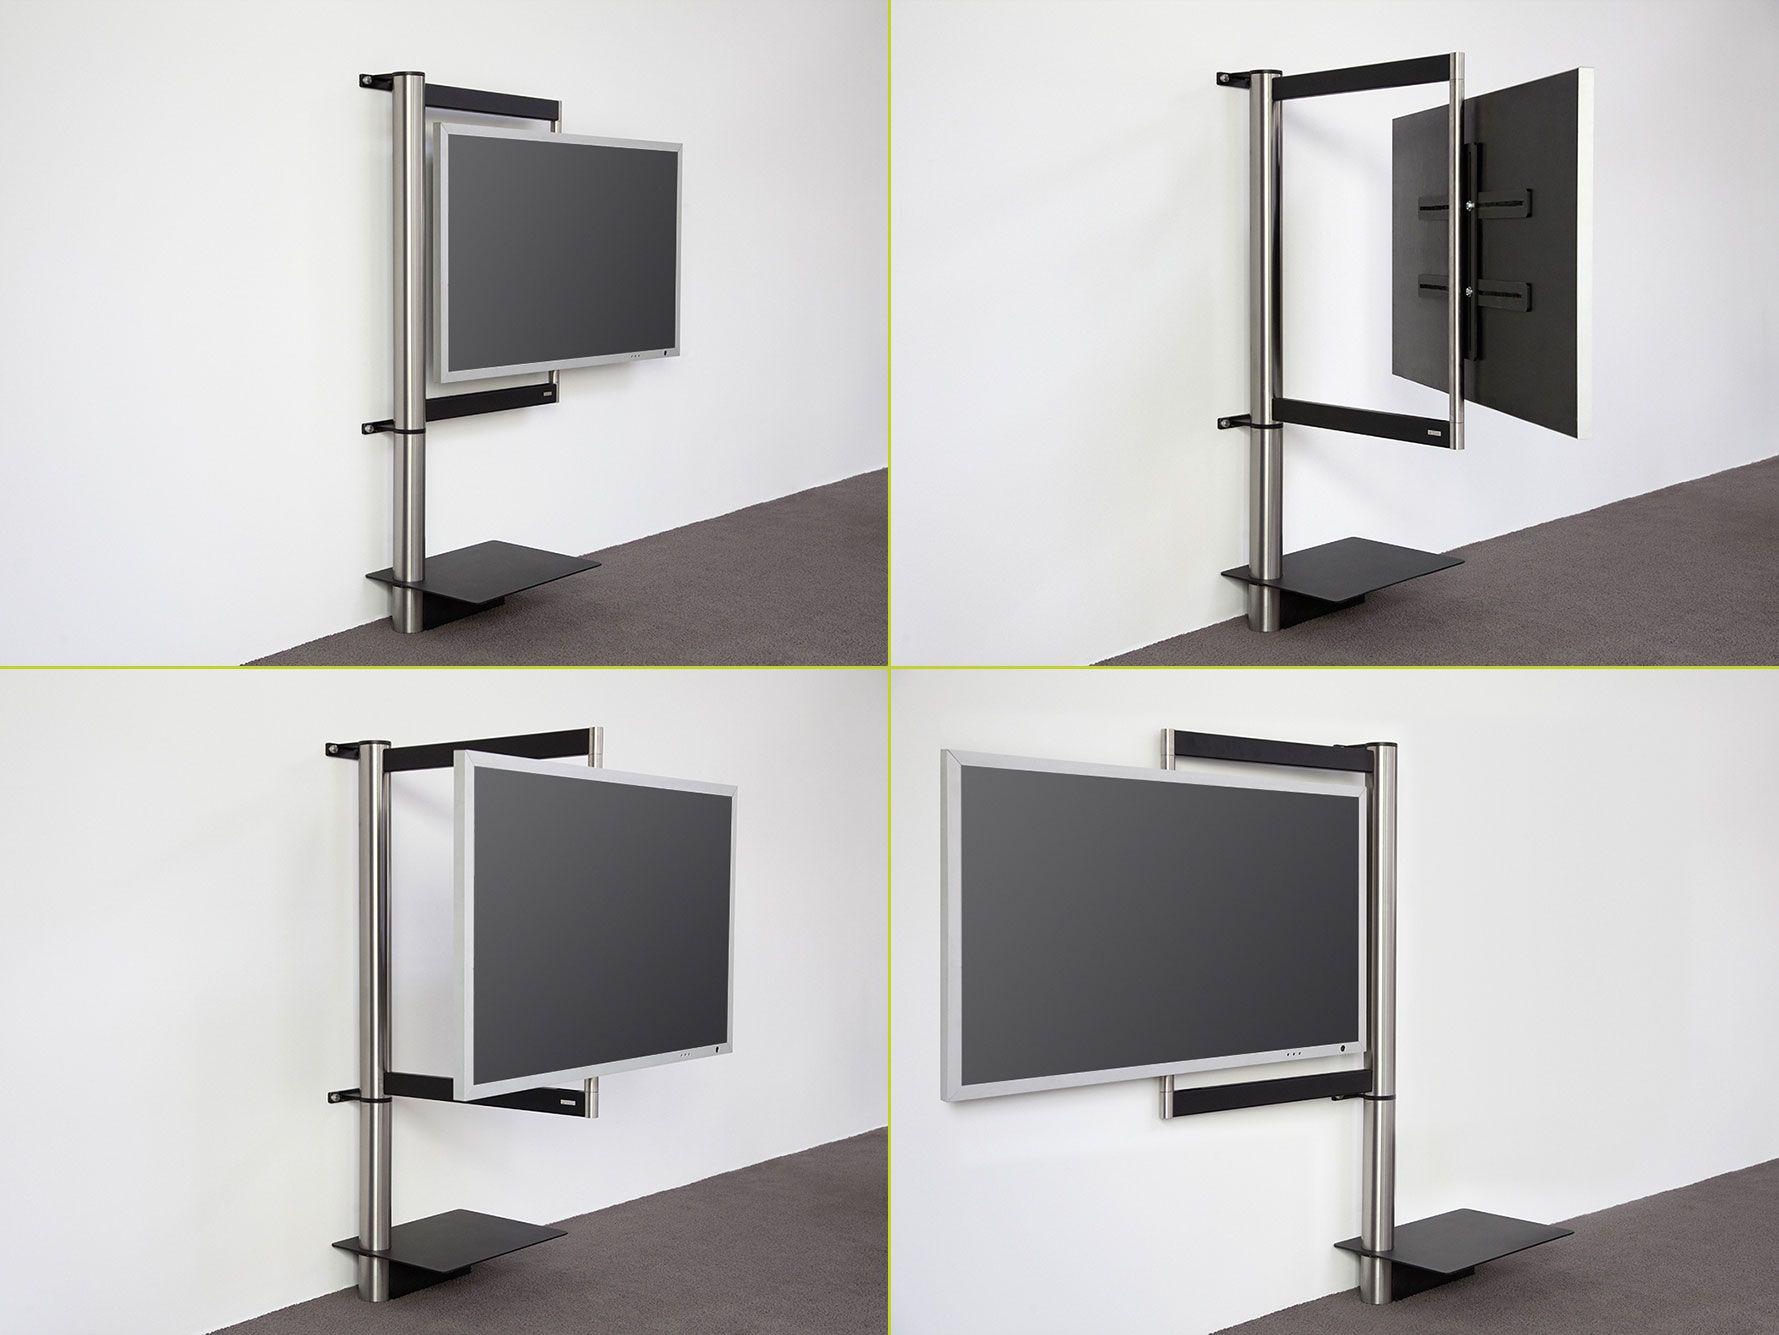 Wissmann Raumobjekte Porta Tv Girevole.Wissman Tv Wand Halter Art112 Interior Pinterest